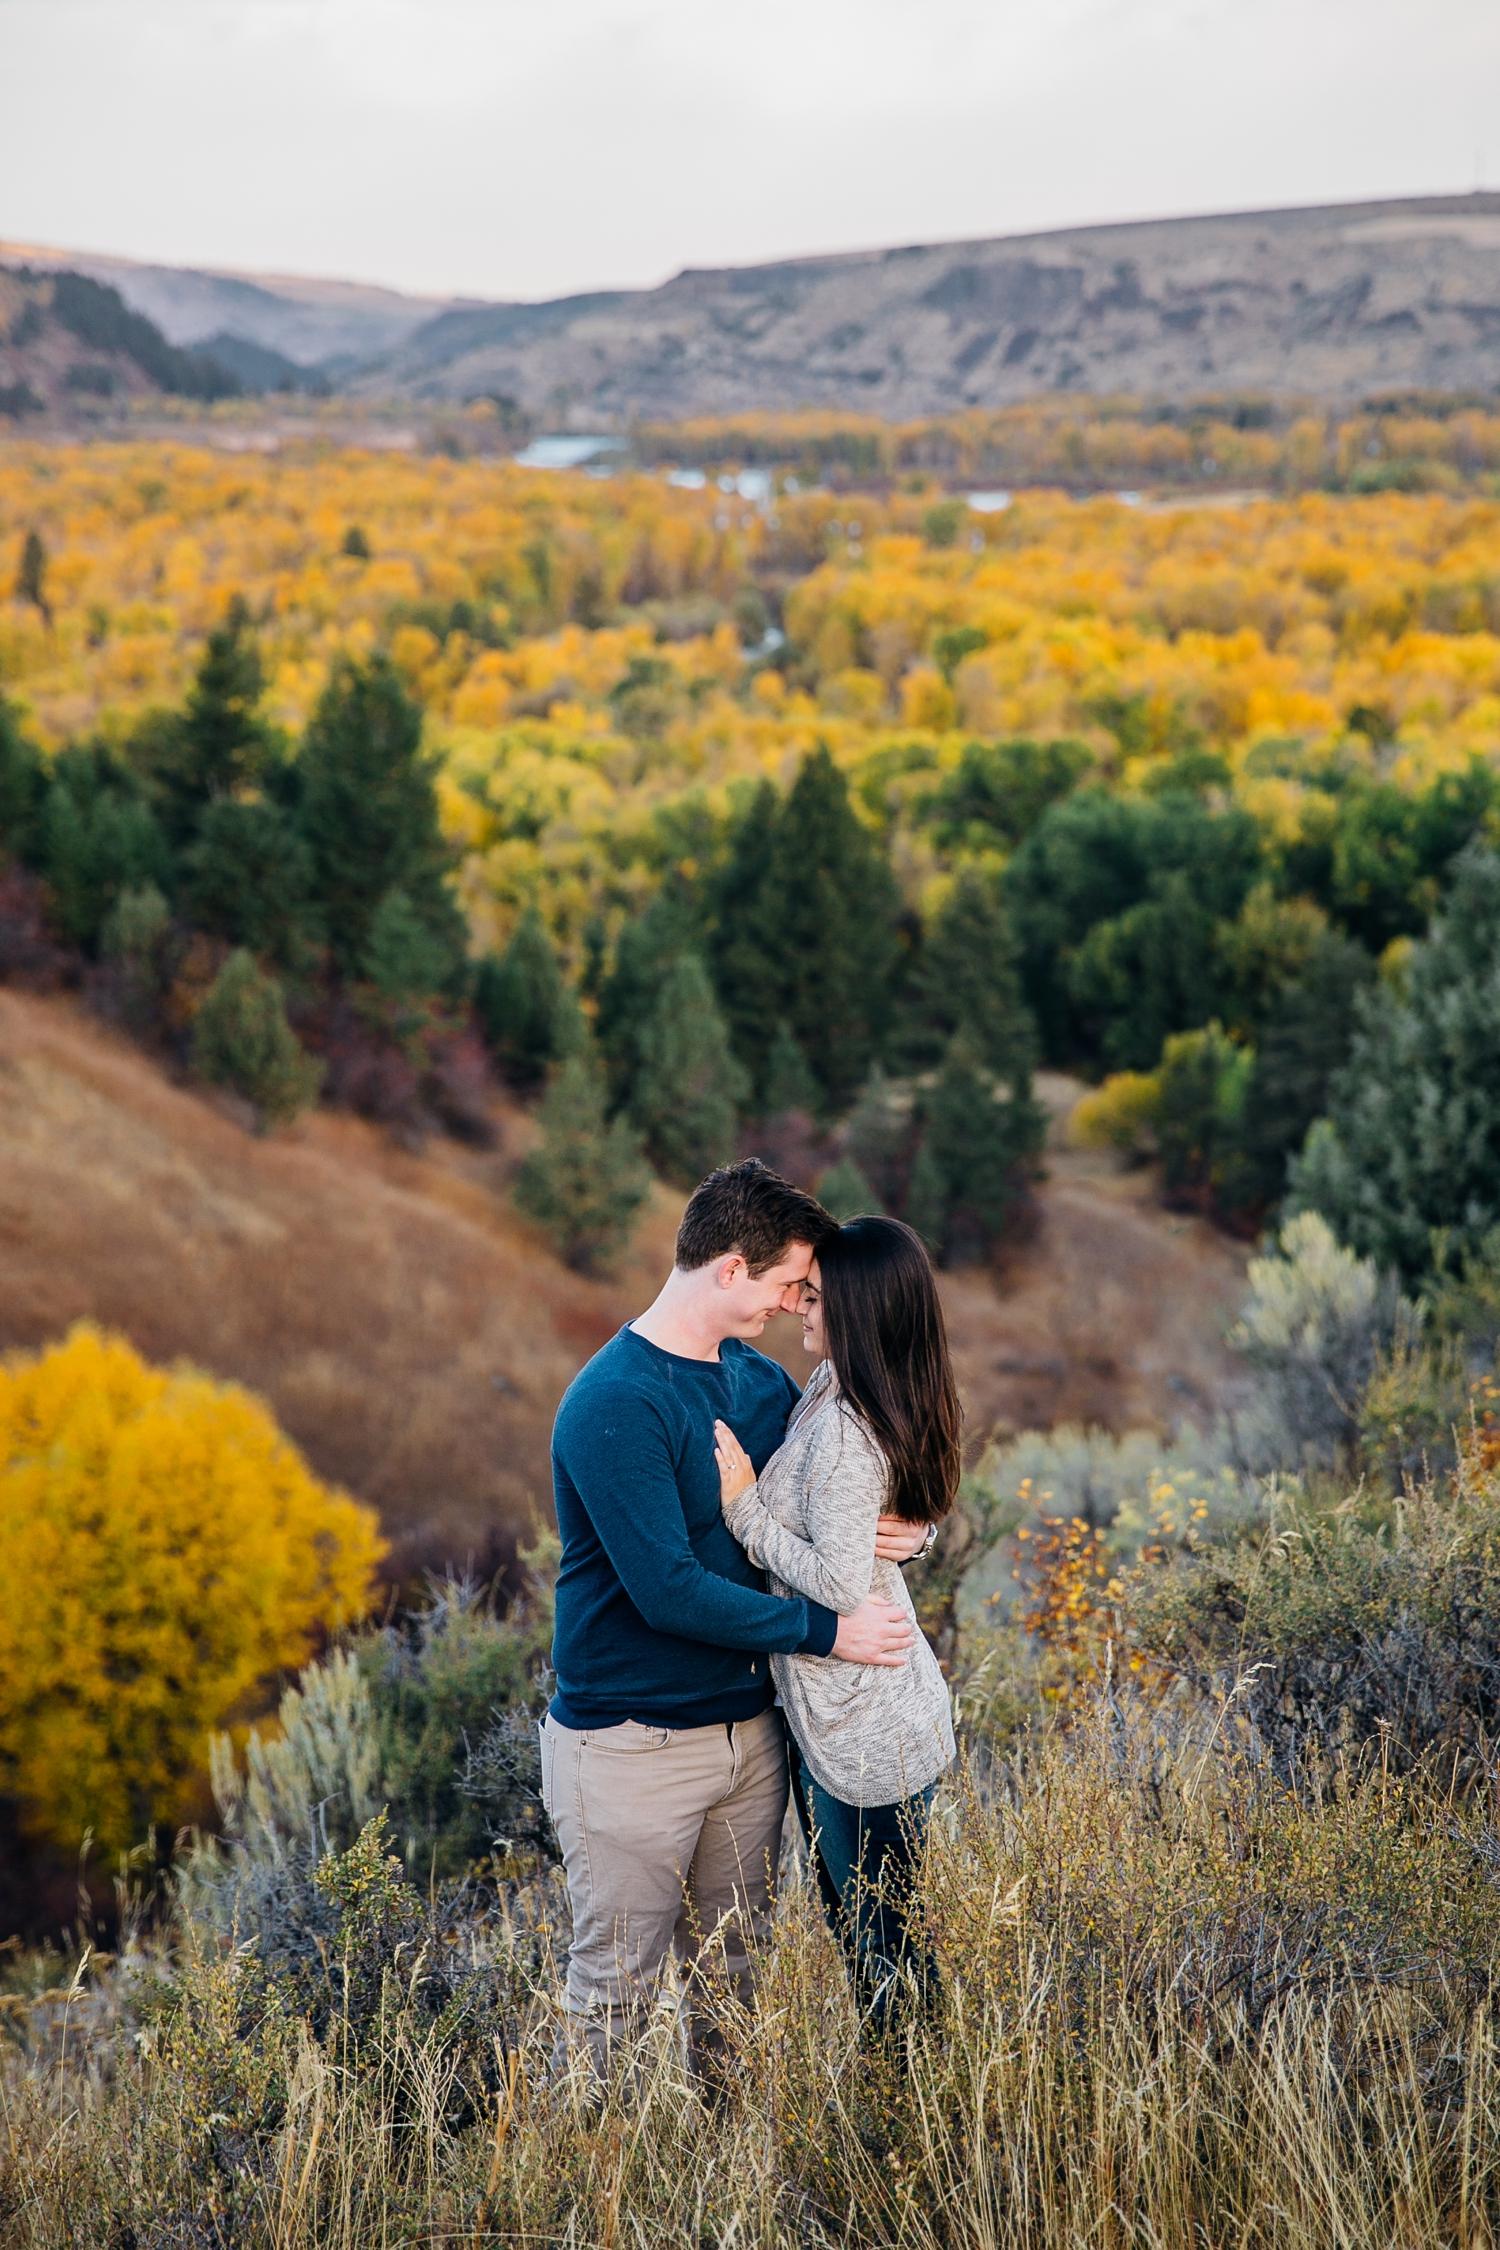 Grand-Teton-National-Park-Elopement-Intimate-Wedding-Elope-Mountains-Jackson-Wyoming-JayCee-Photography_1679.jpg